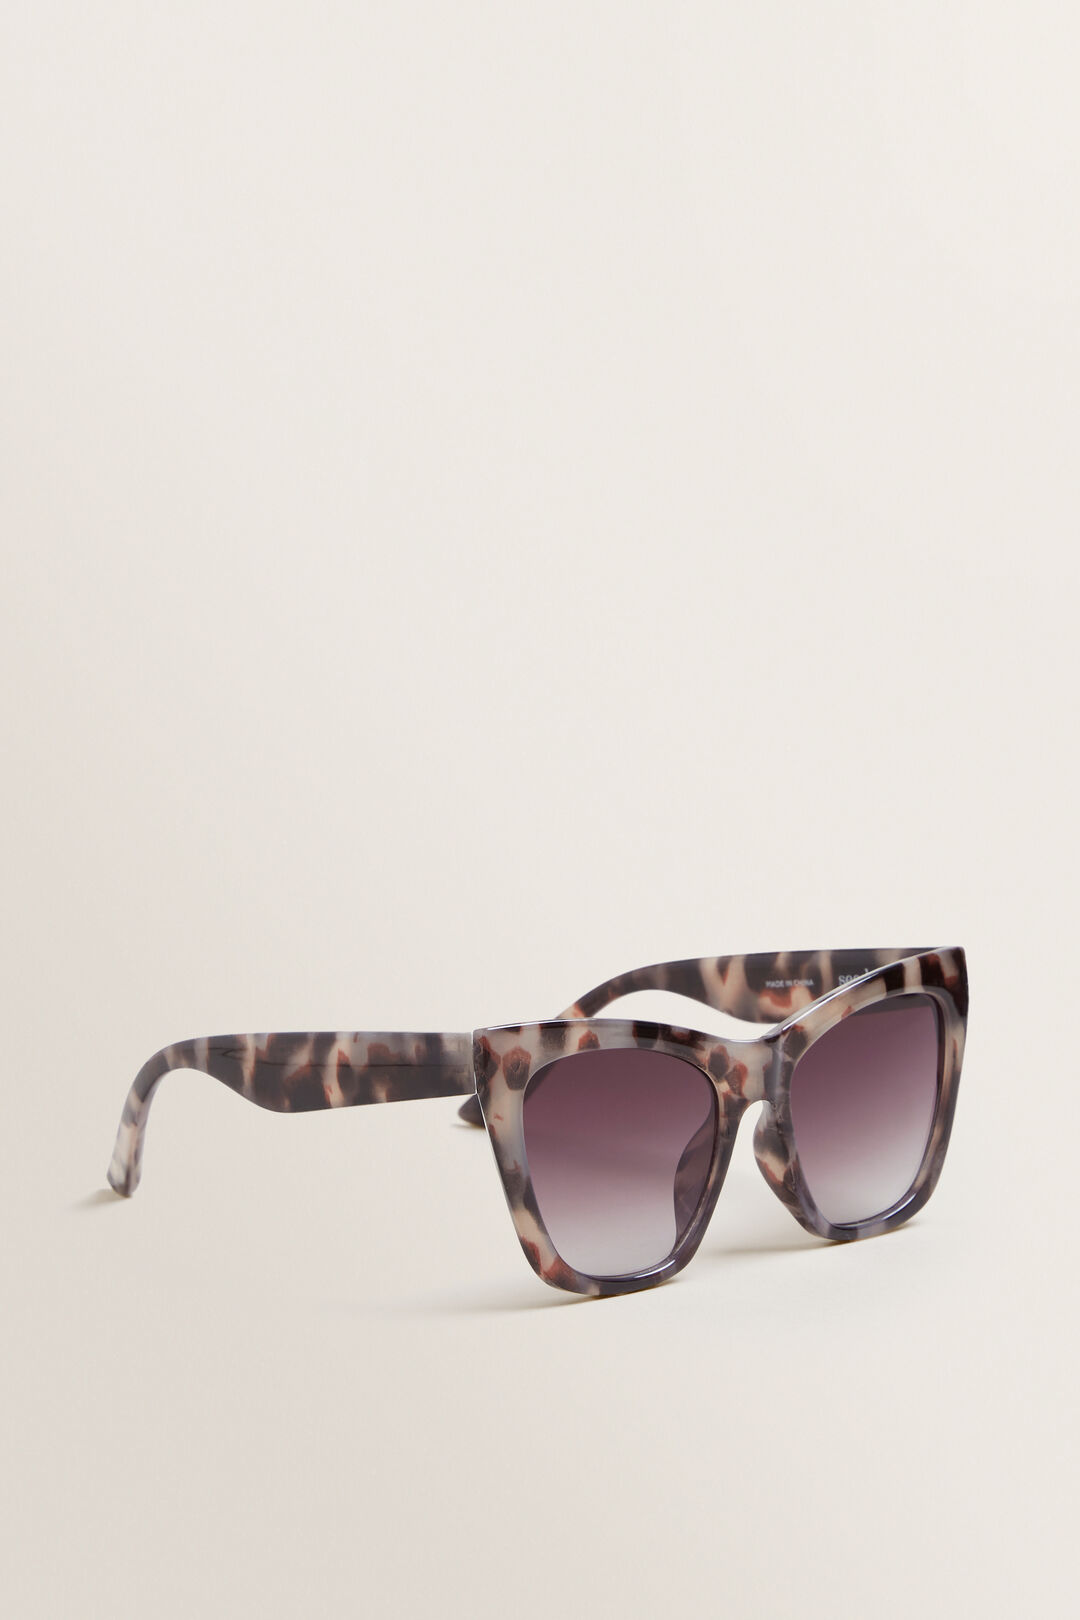 Anna Cateye Sunglasses  MILKY TORT  hi-res